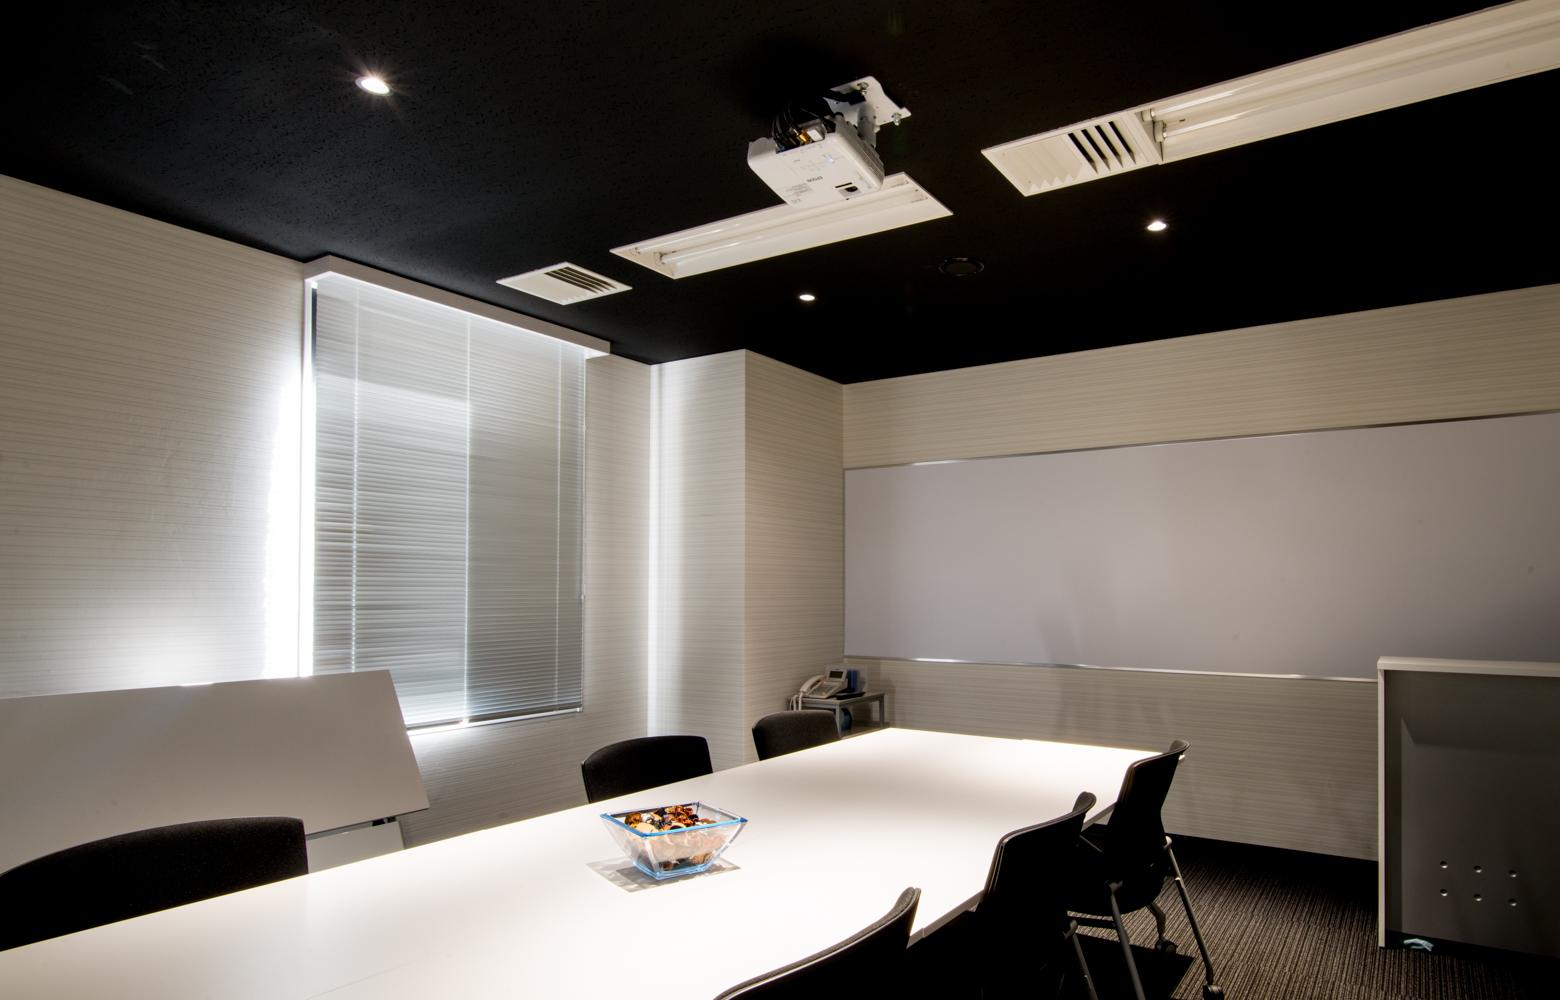 ECマーケティング株式会社 Meeting Room デザイン・レイアウト事例